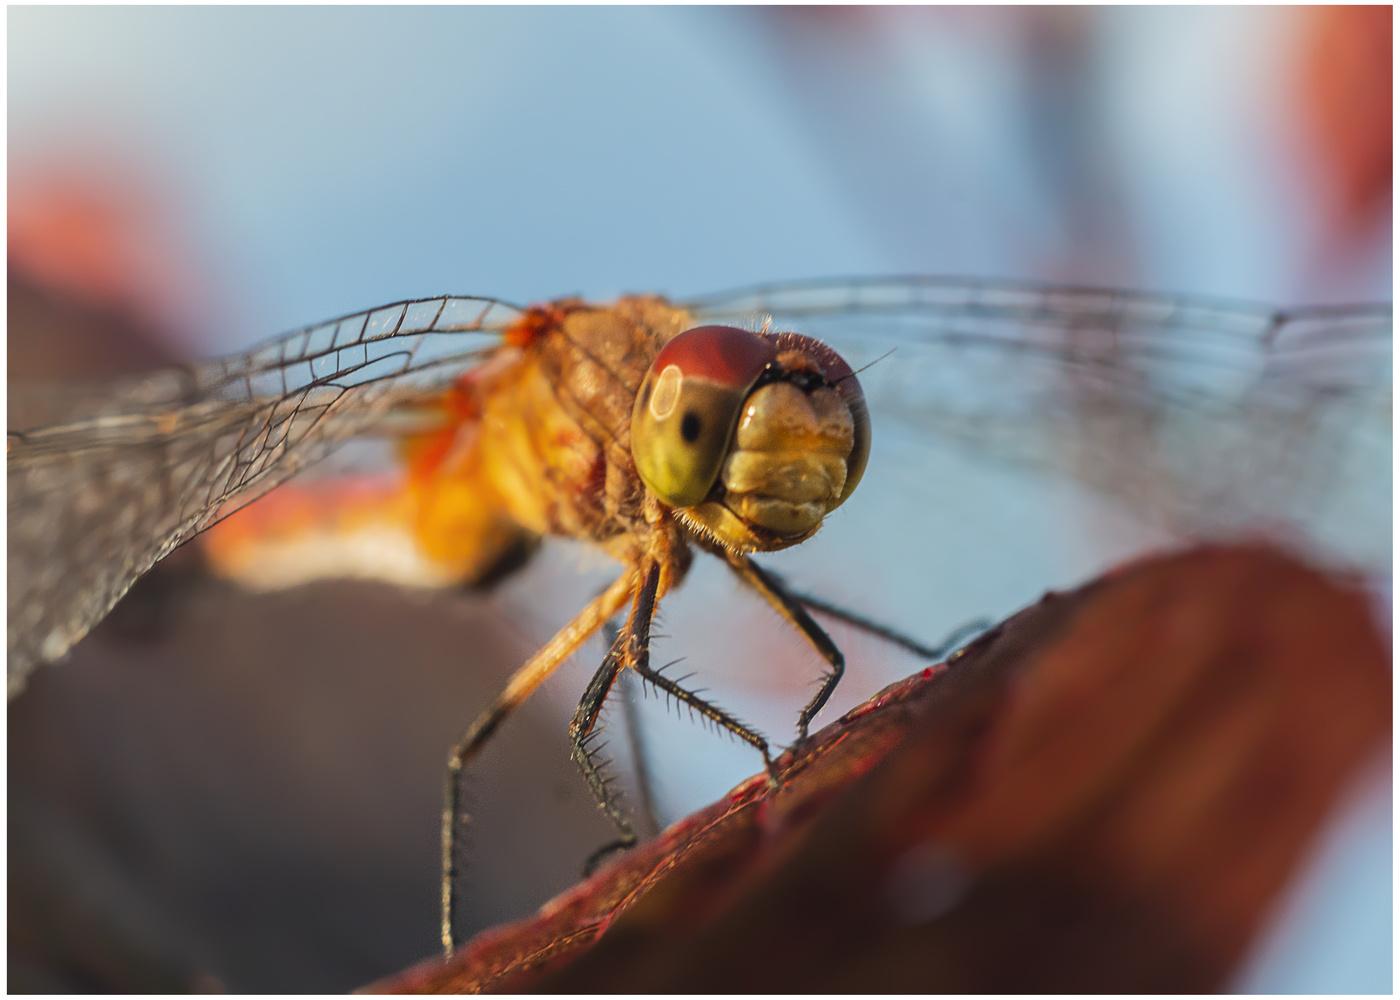 Dragonfly by Daniel Frost